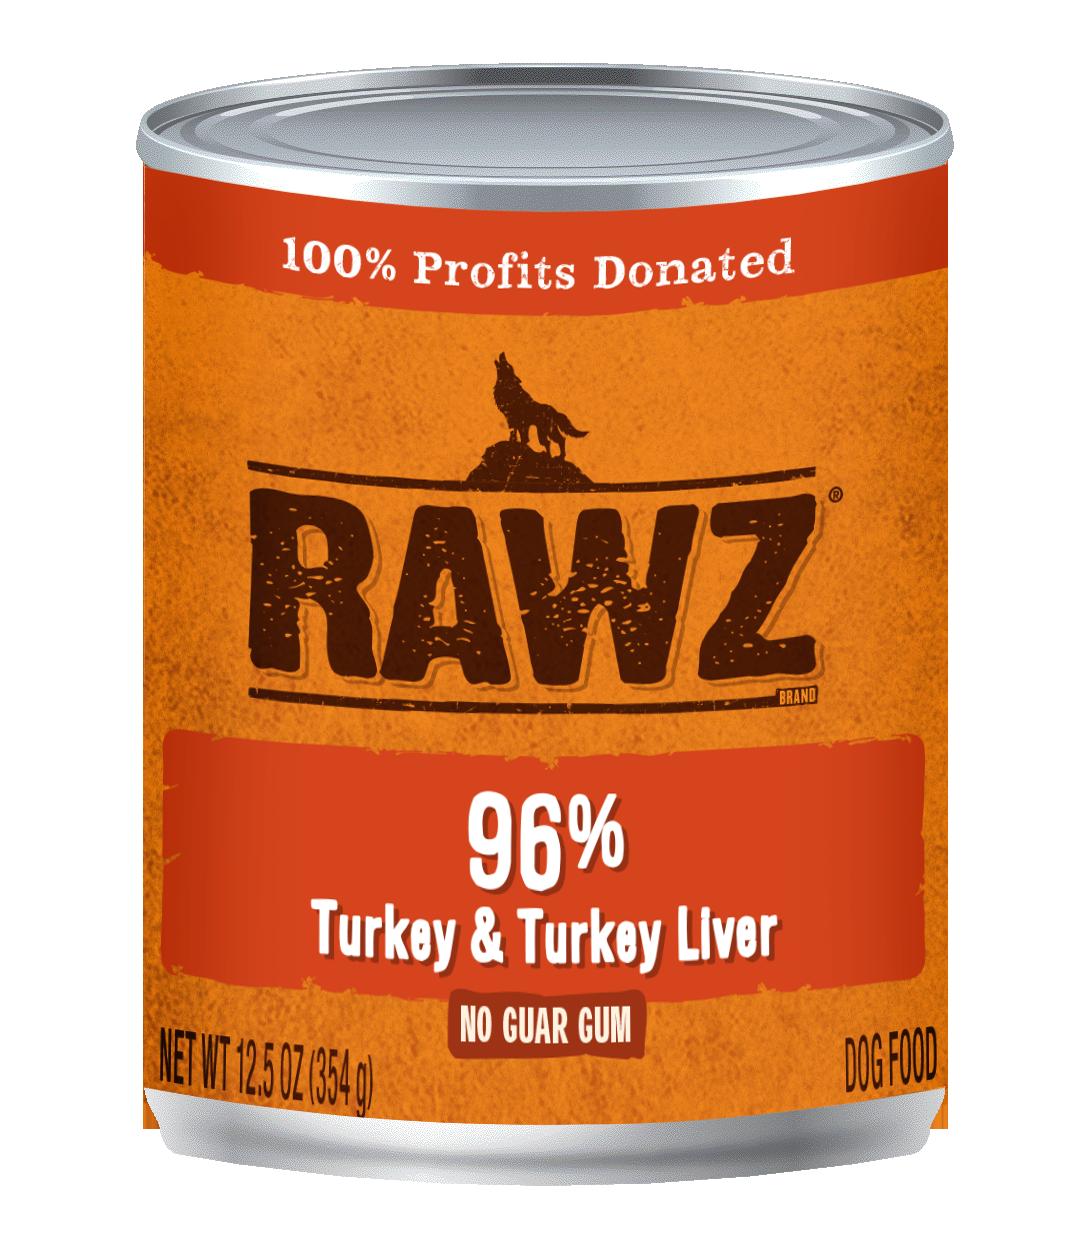 Dog_TurkLiv rawz can.png